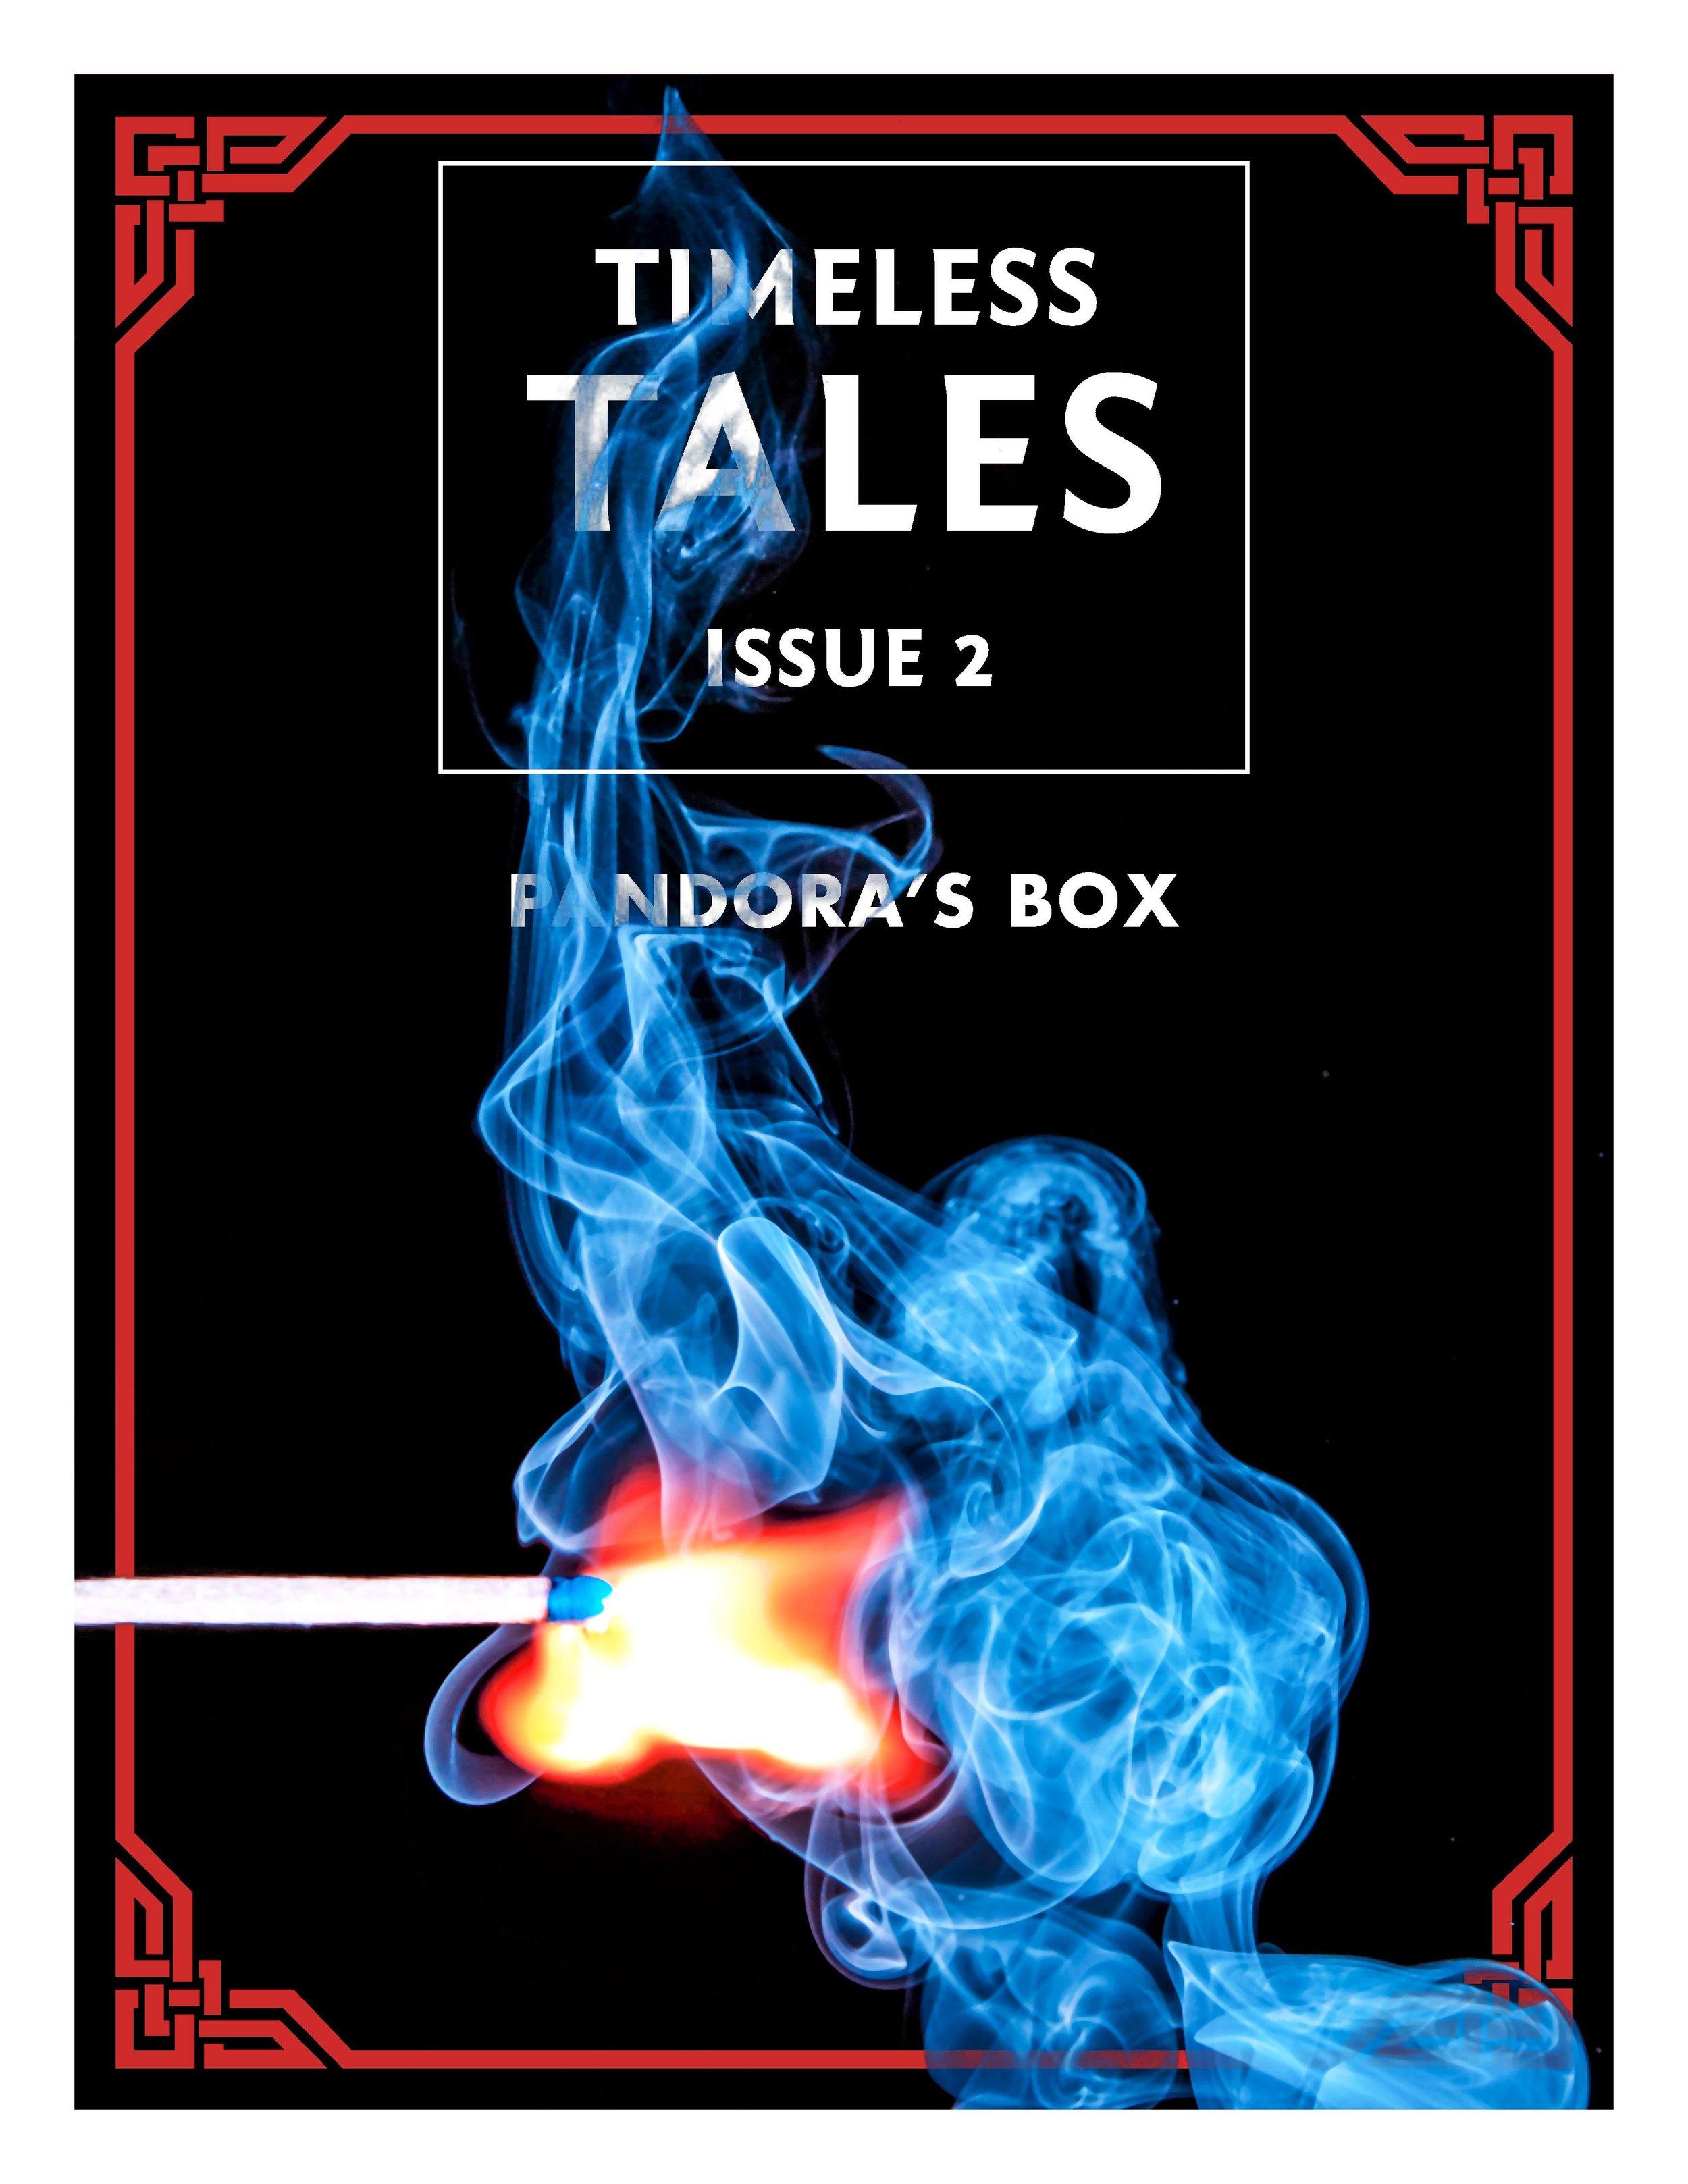 Pandora's Box Cover.jpg